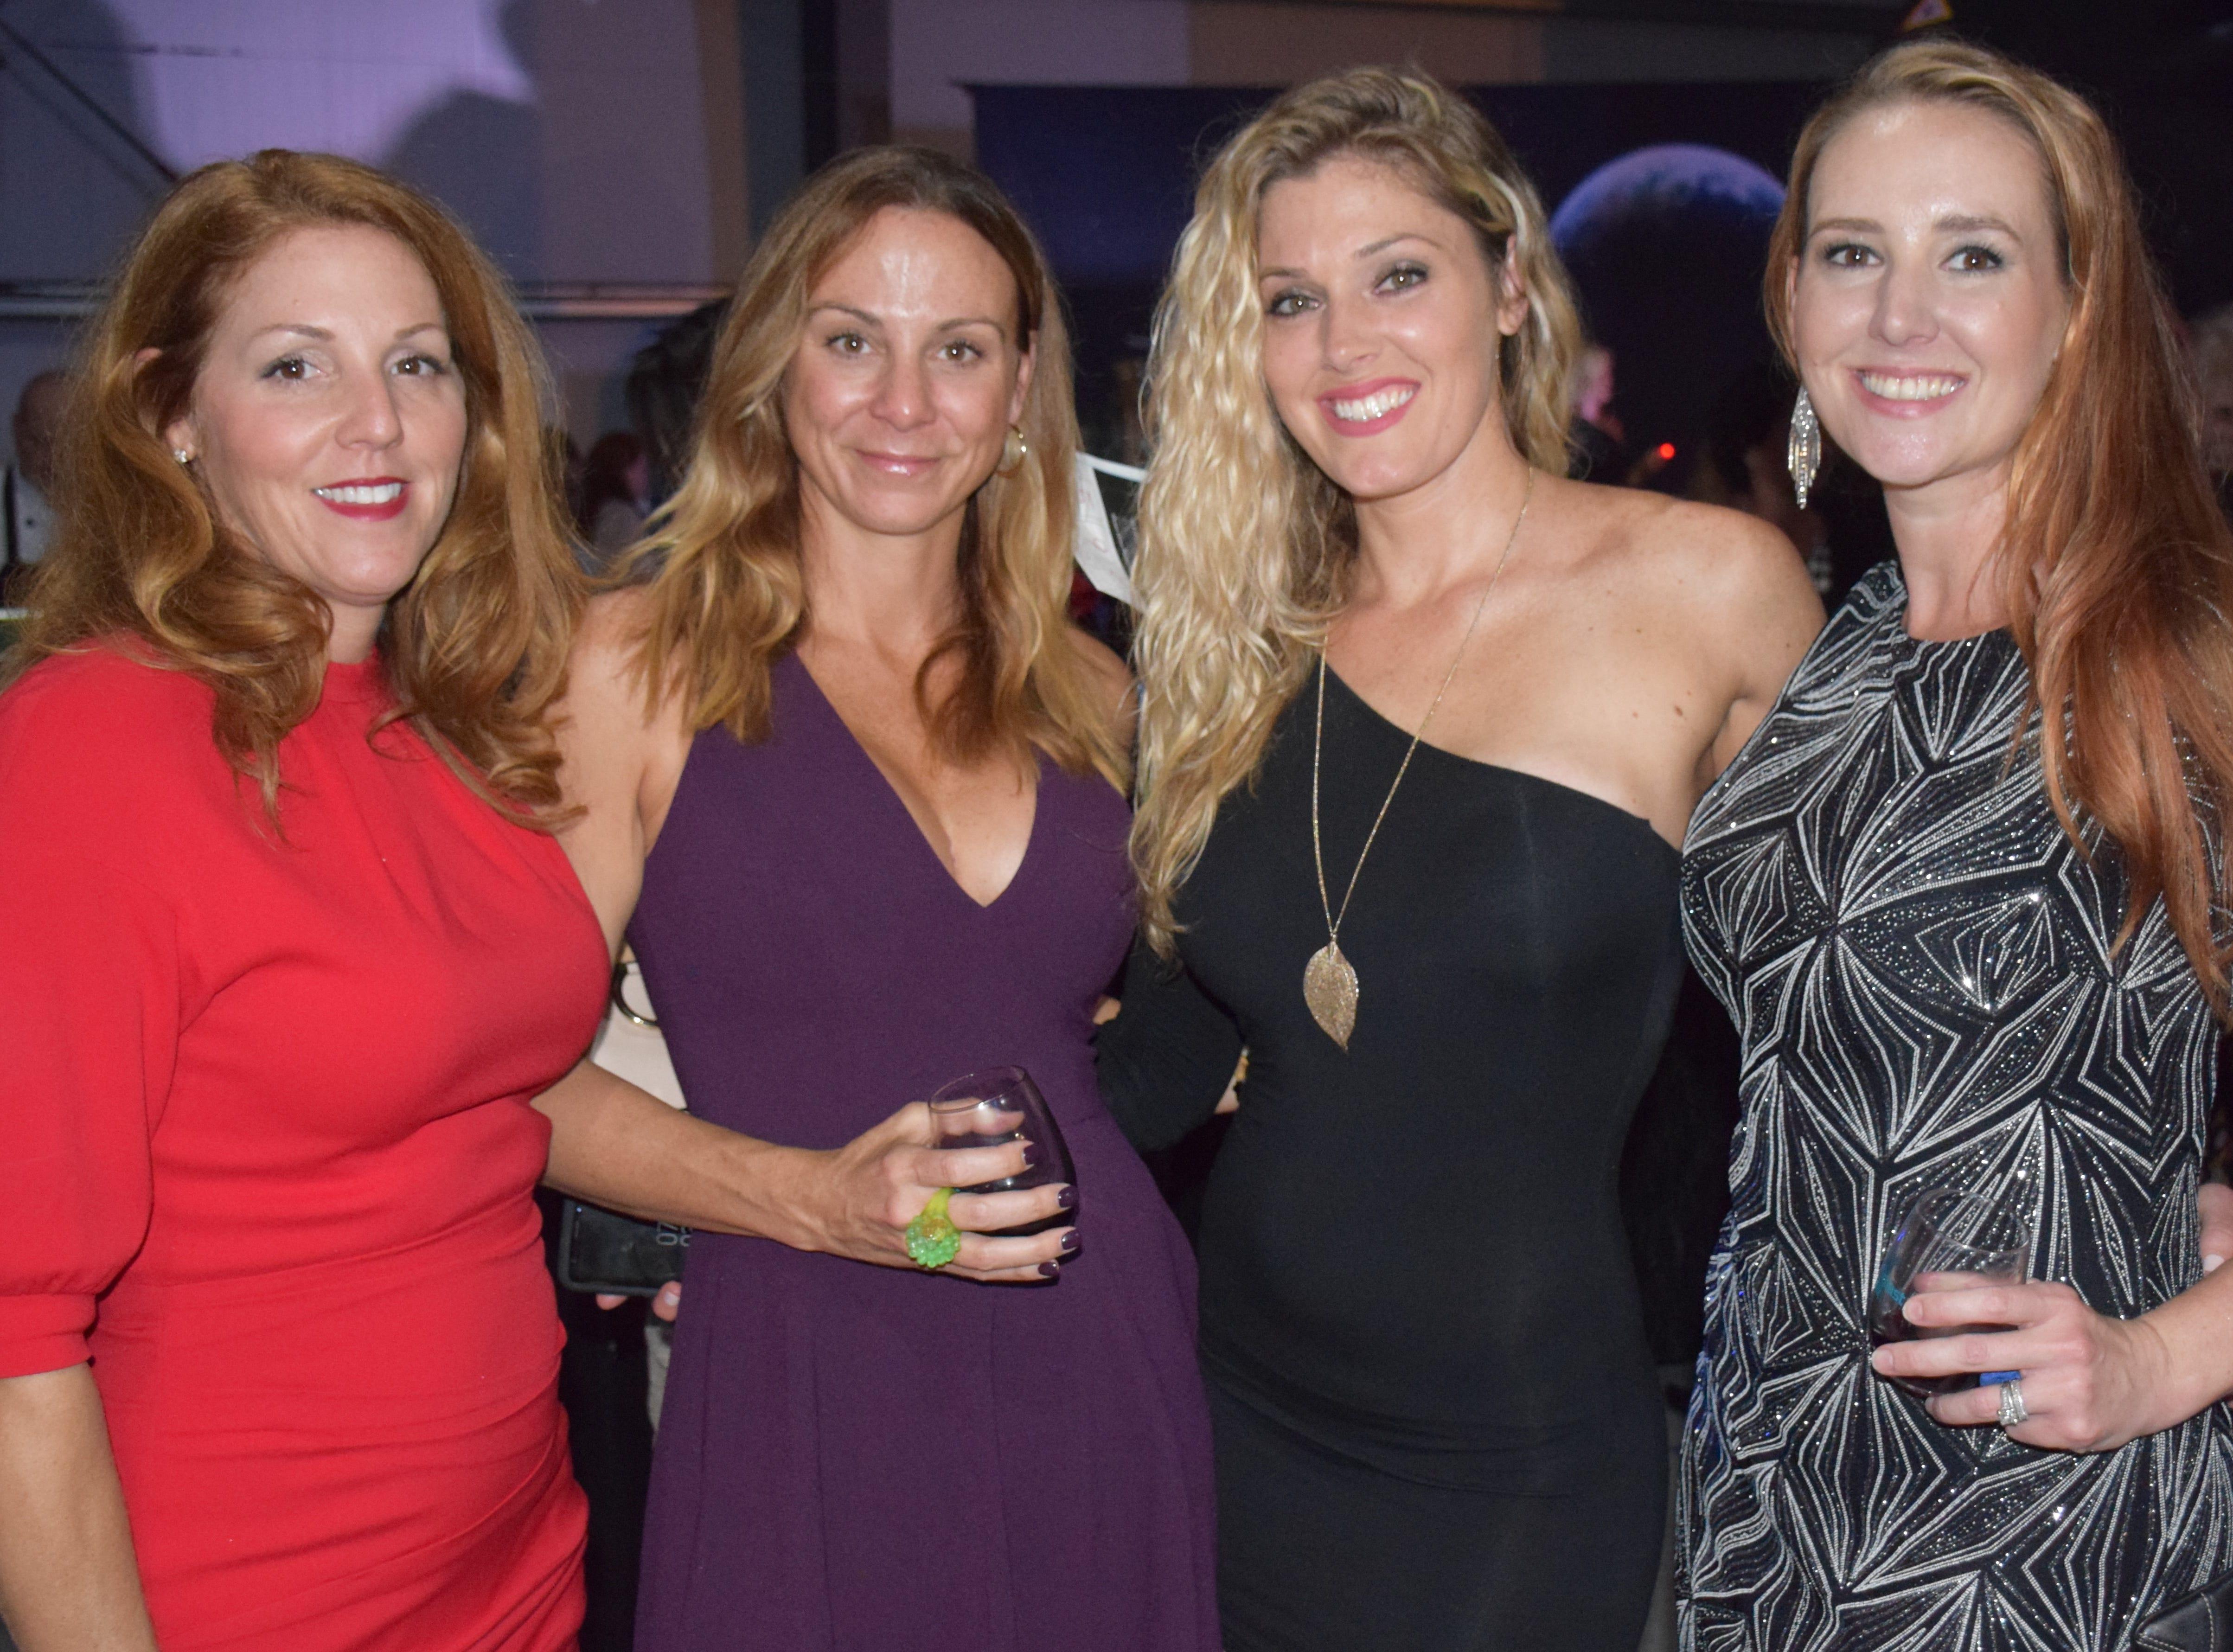 Nikki Bates, Melissa Holmes, Ashley French and Karen Meitner